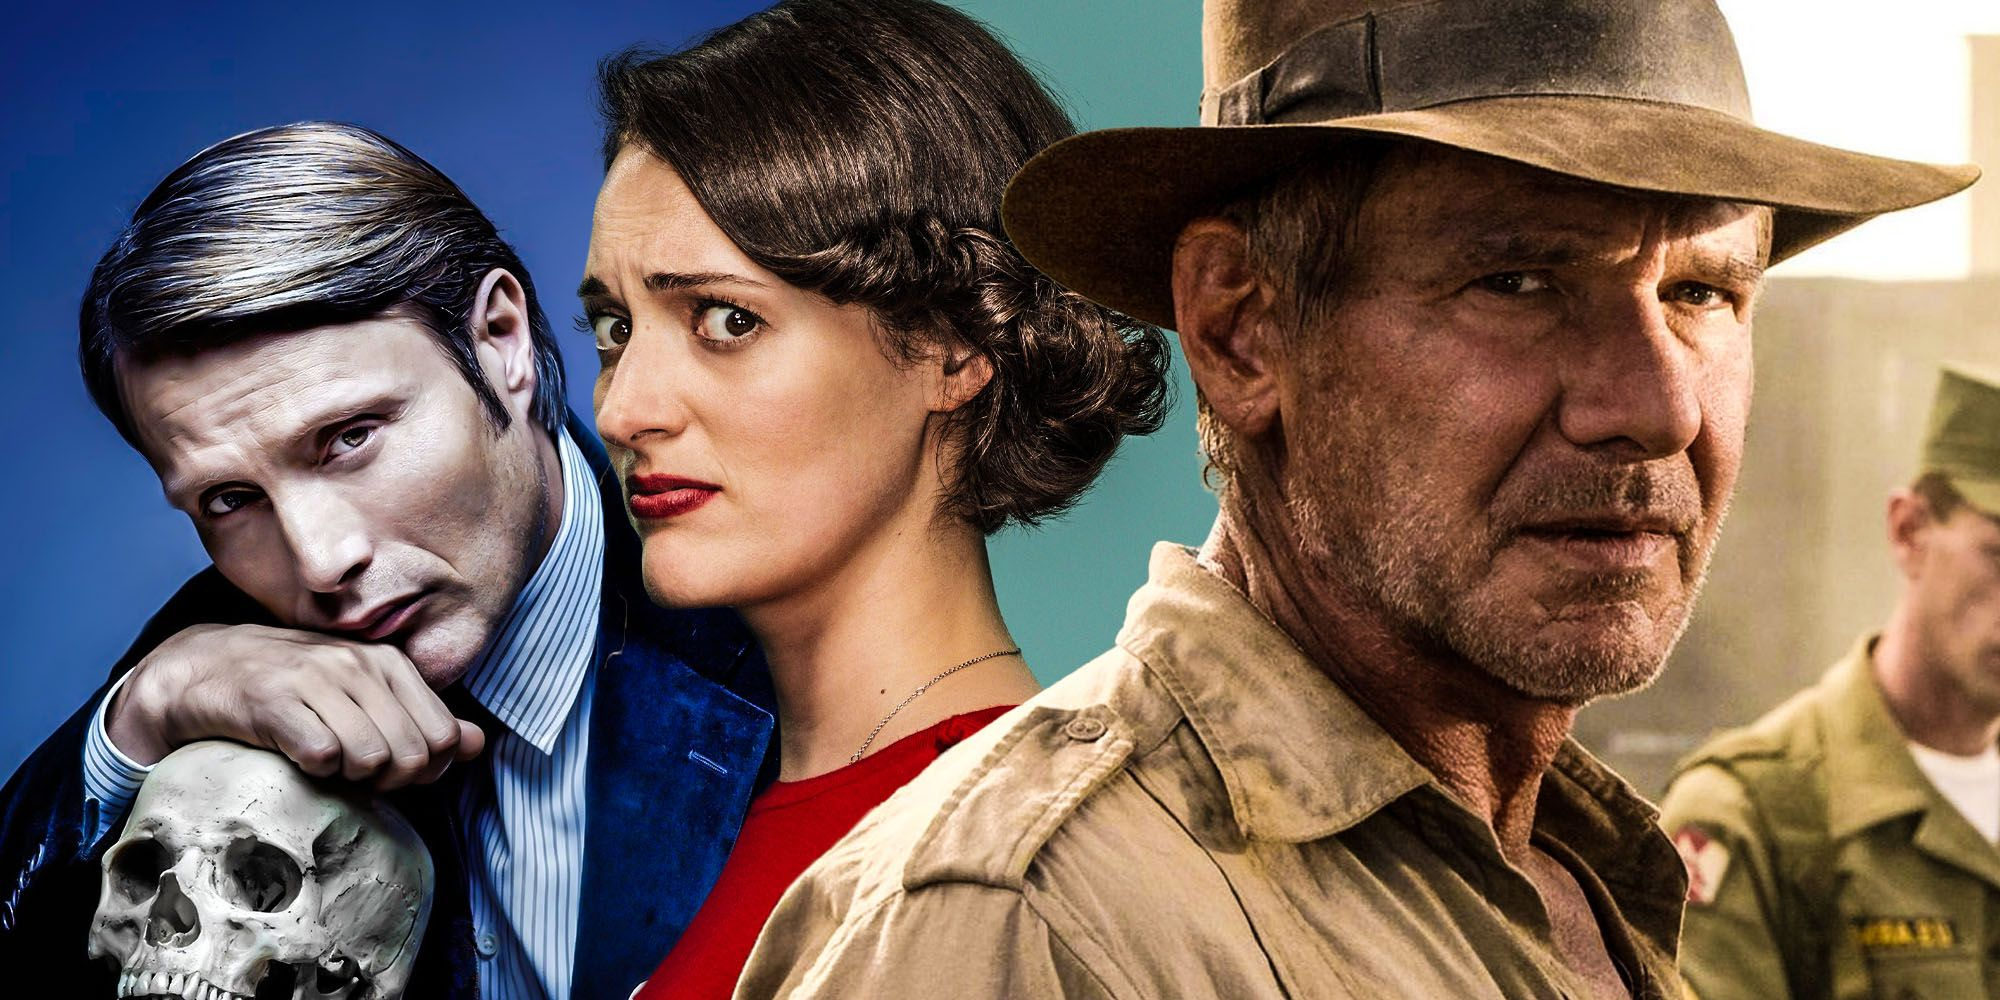 Indiana Jones 5 Cast: Every Actor Confirmed So Far | Screen Rant